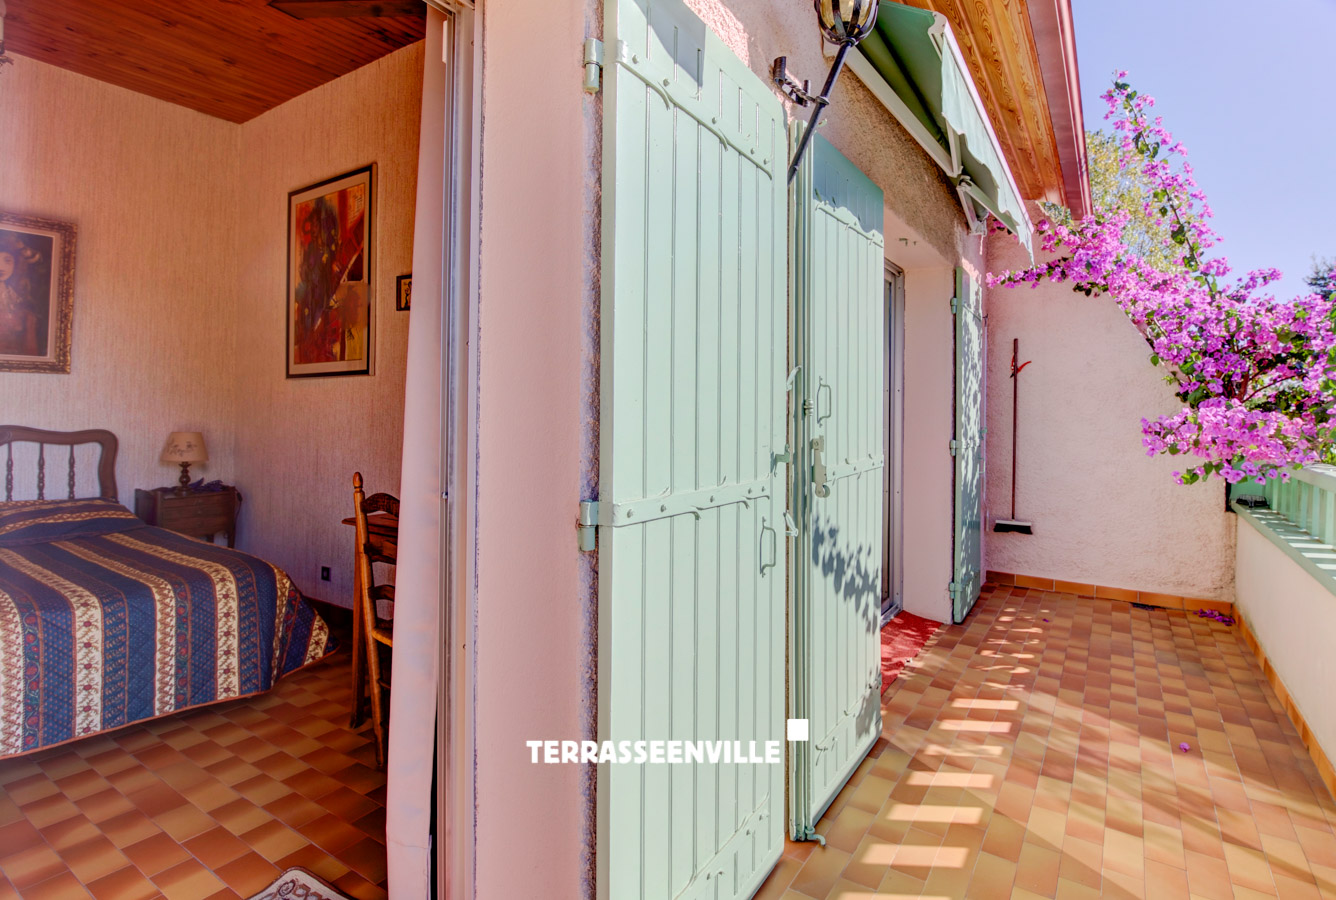 terrasse-13-2.jpg